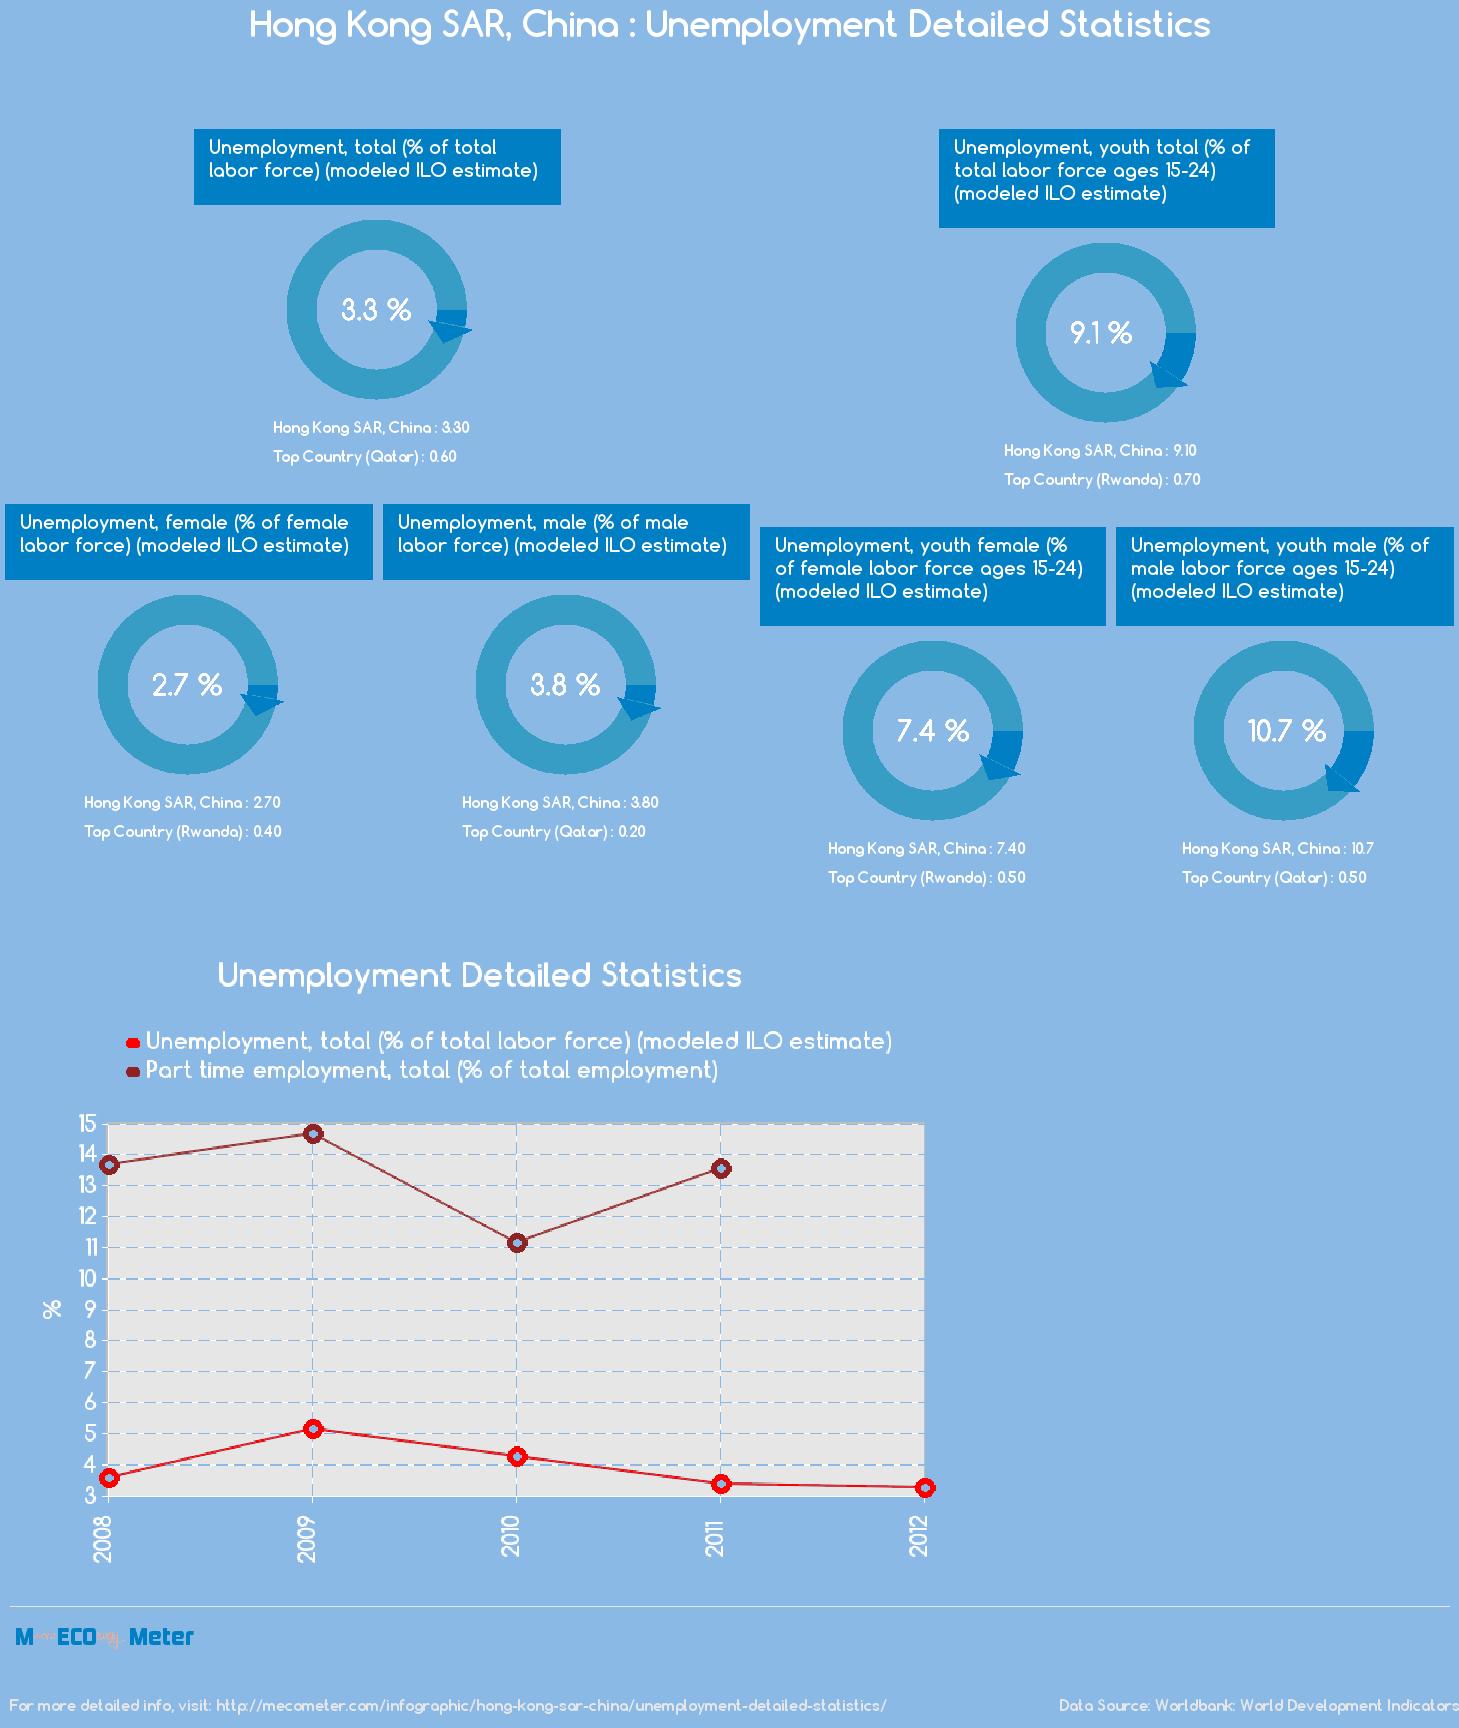 Hong Kong SAR, China : Unemployment Detailed Statistics